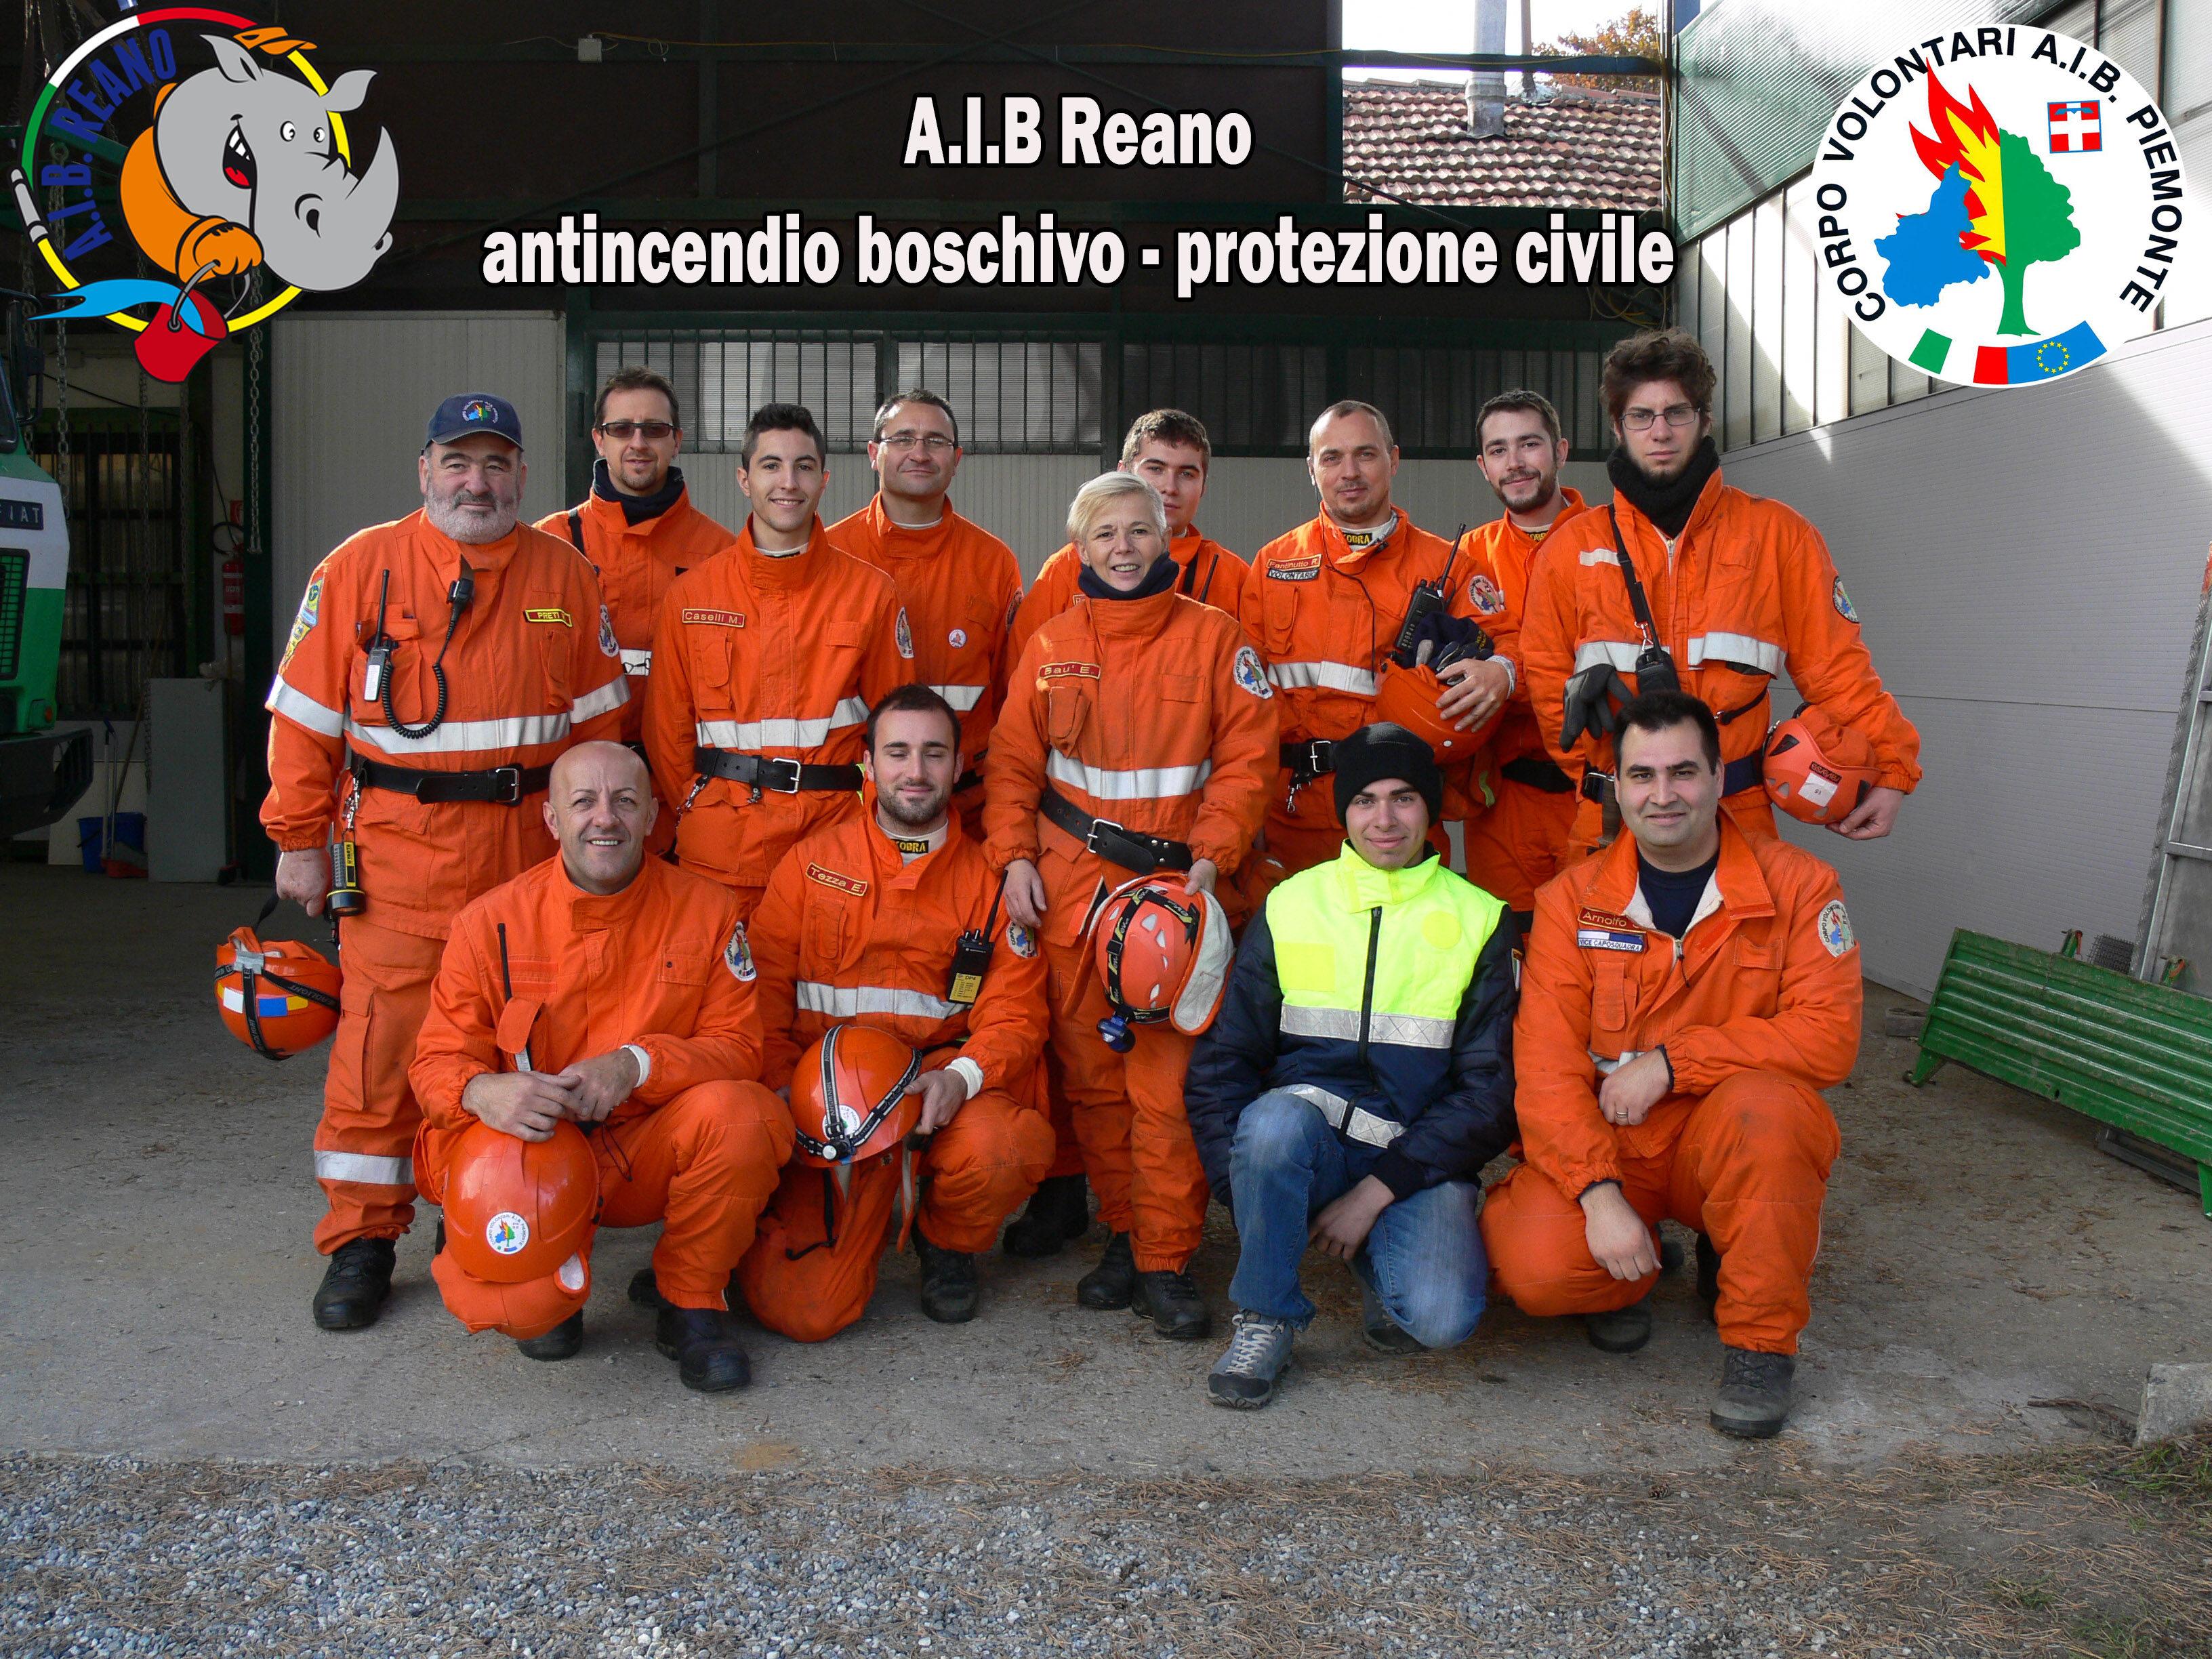 AIB REANO